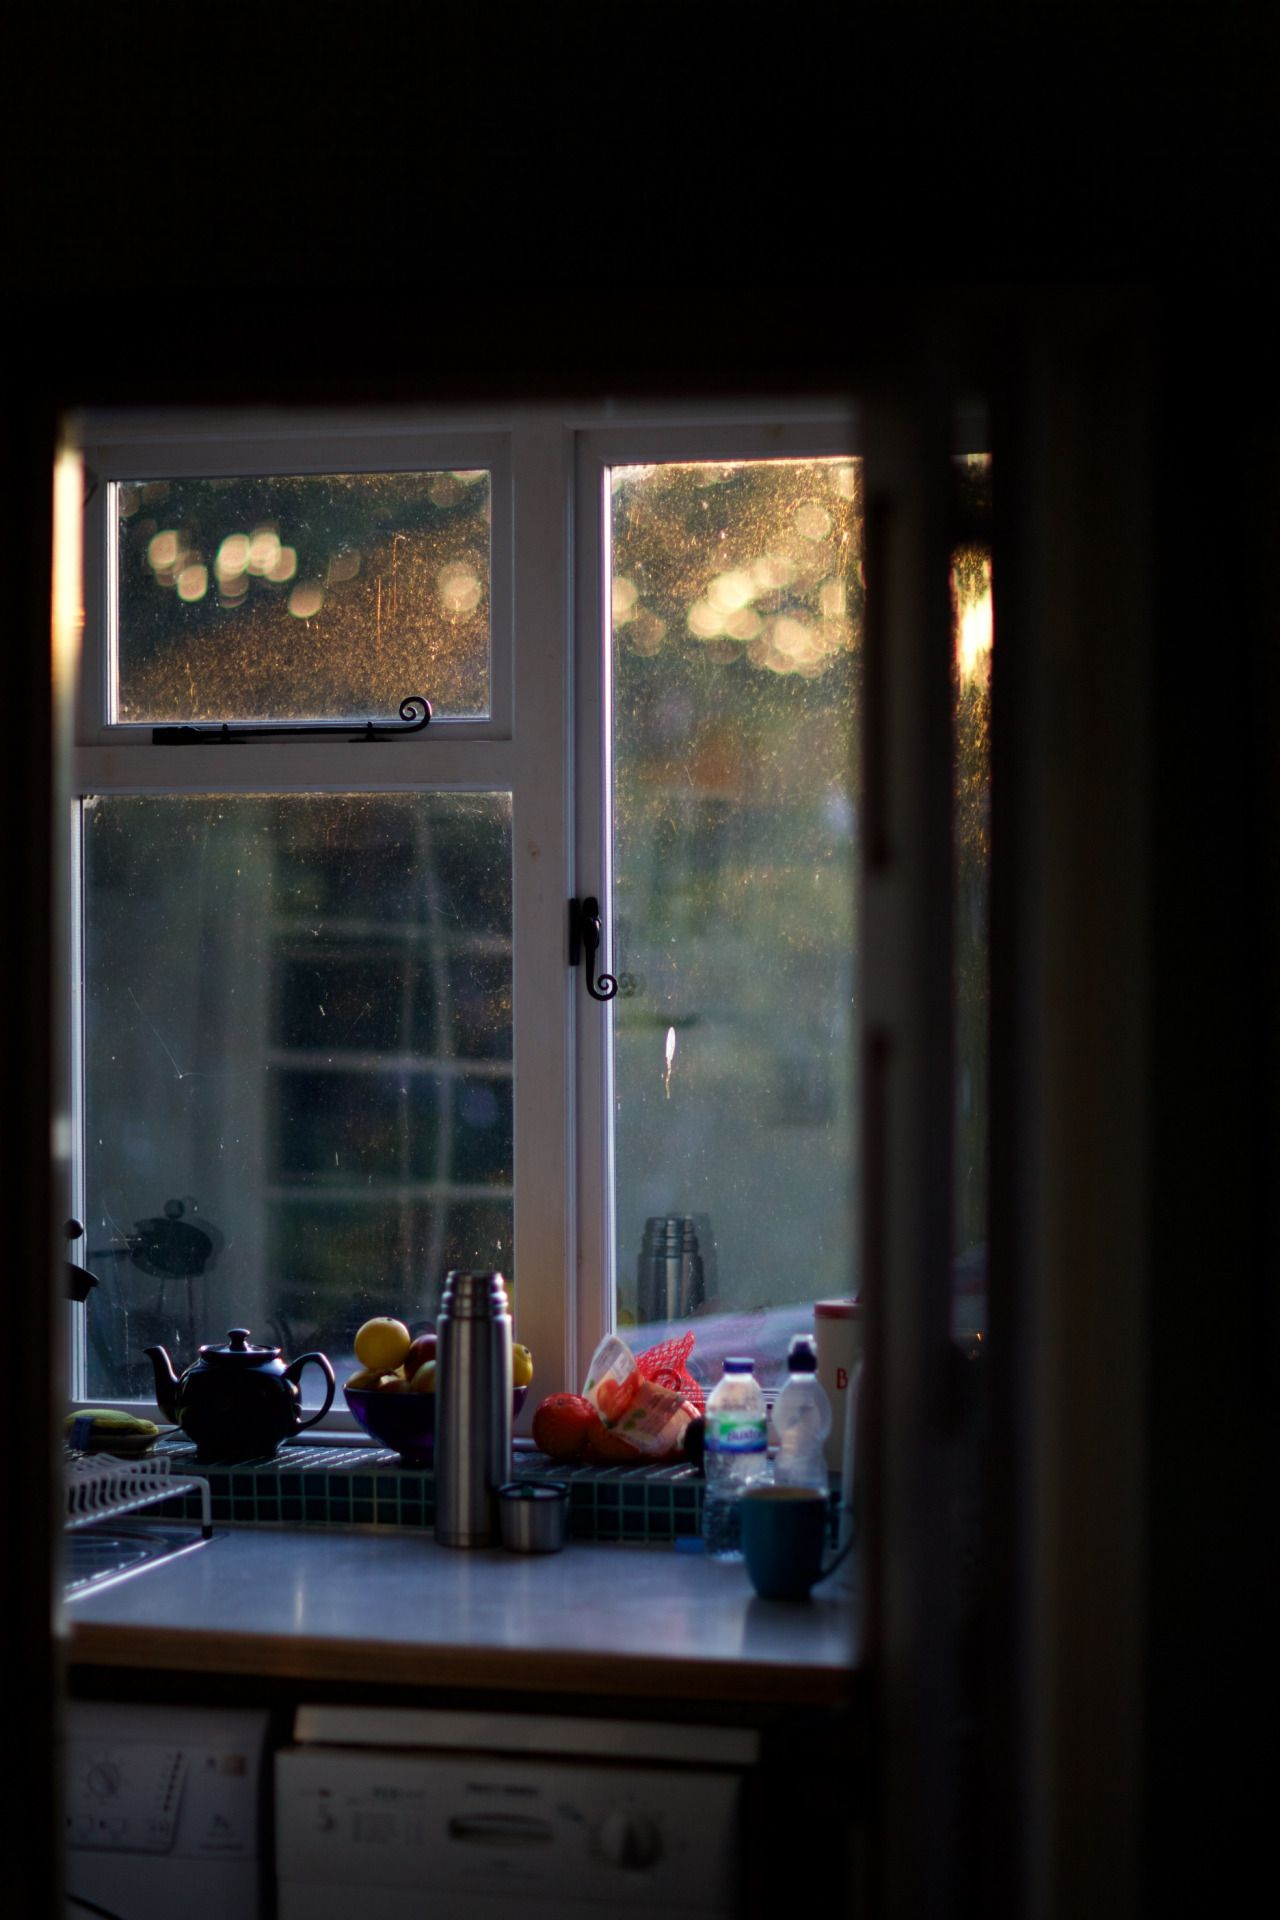 Kitchen window ledge  lensblrnetwork ramparts morning by jules justjulespicturestumblr